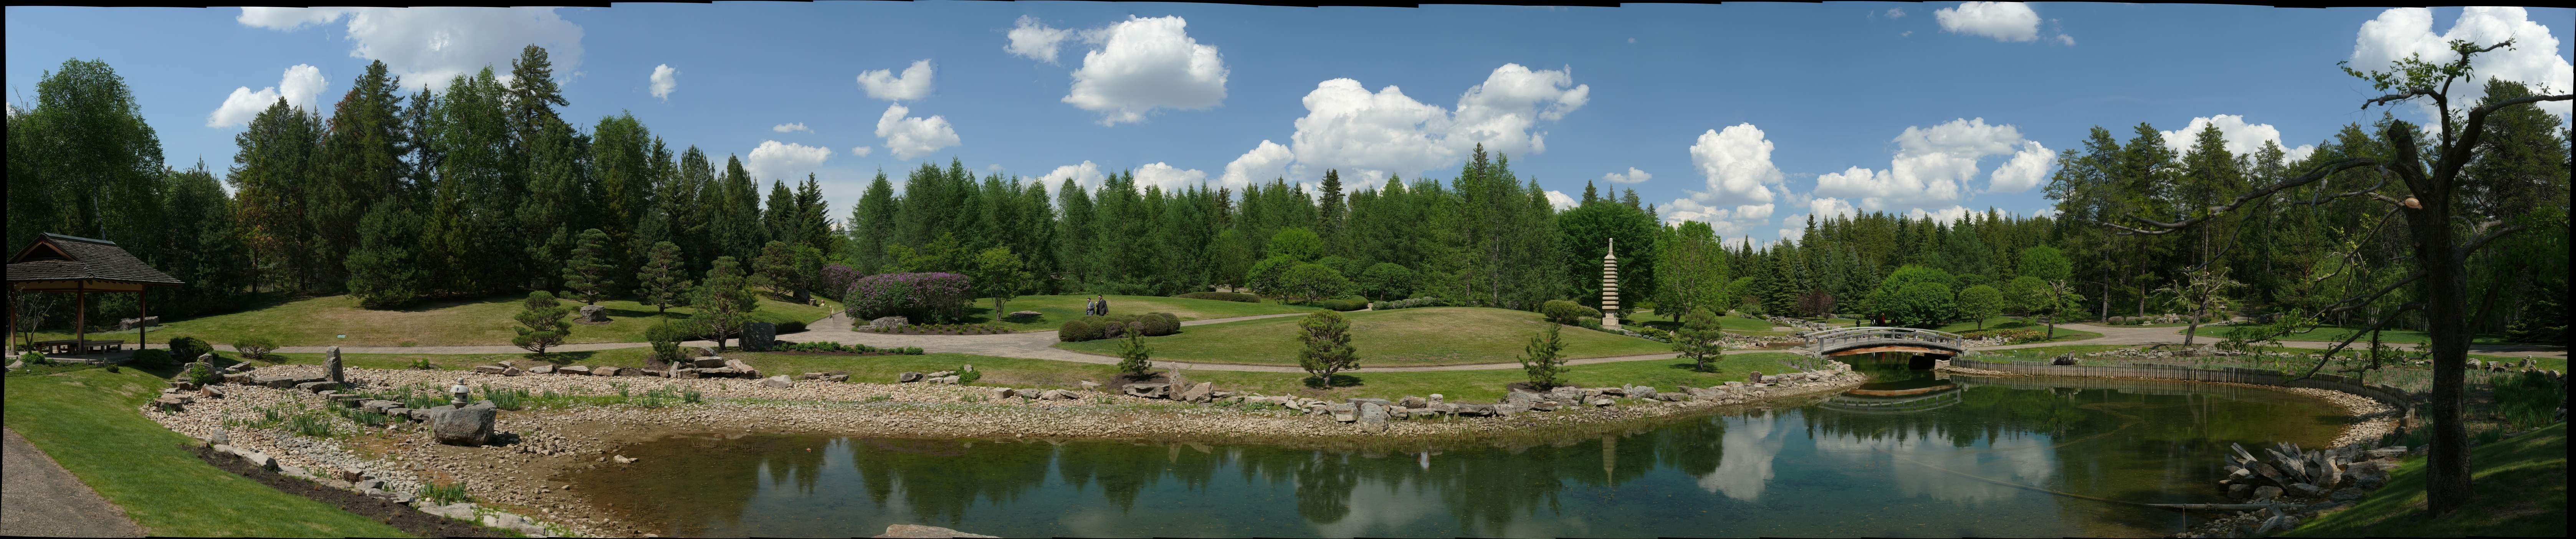 Kurimoto  Japanese garden .jpg